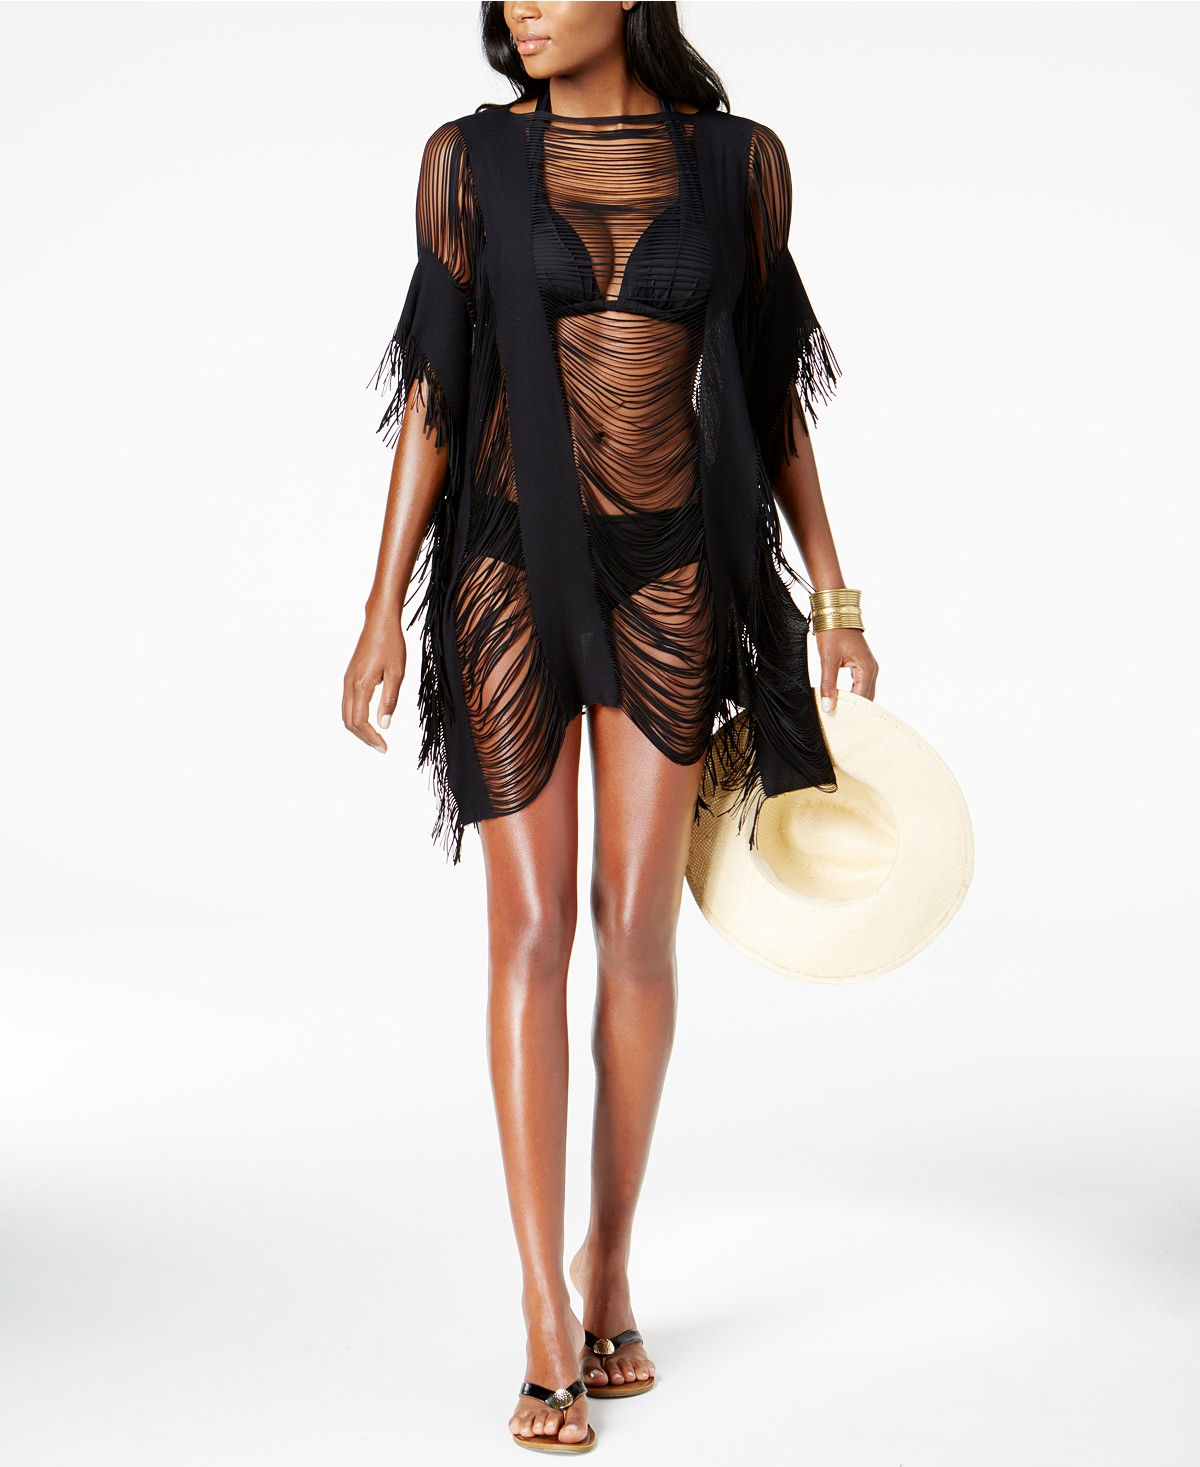 Hot Swimsuit Coverups Inspired by Larsa Pipen's Miami Look, swimsuit coverups, miami, swimsuit, bikini, swim